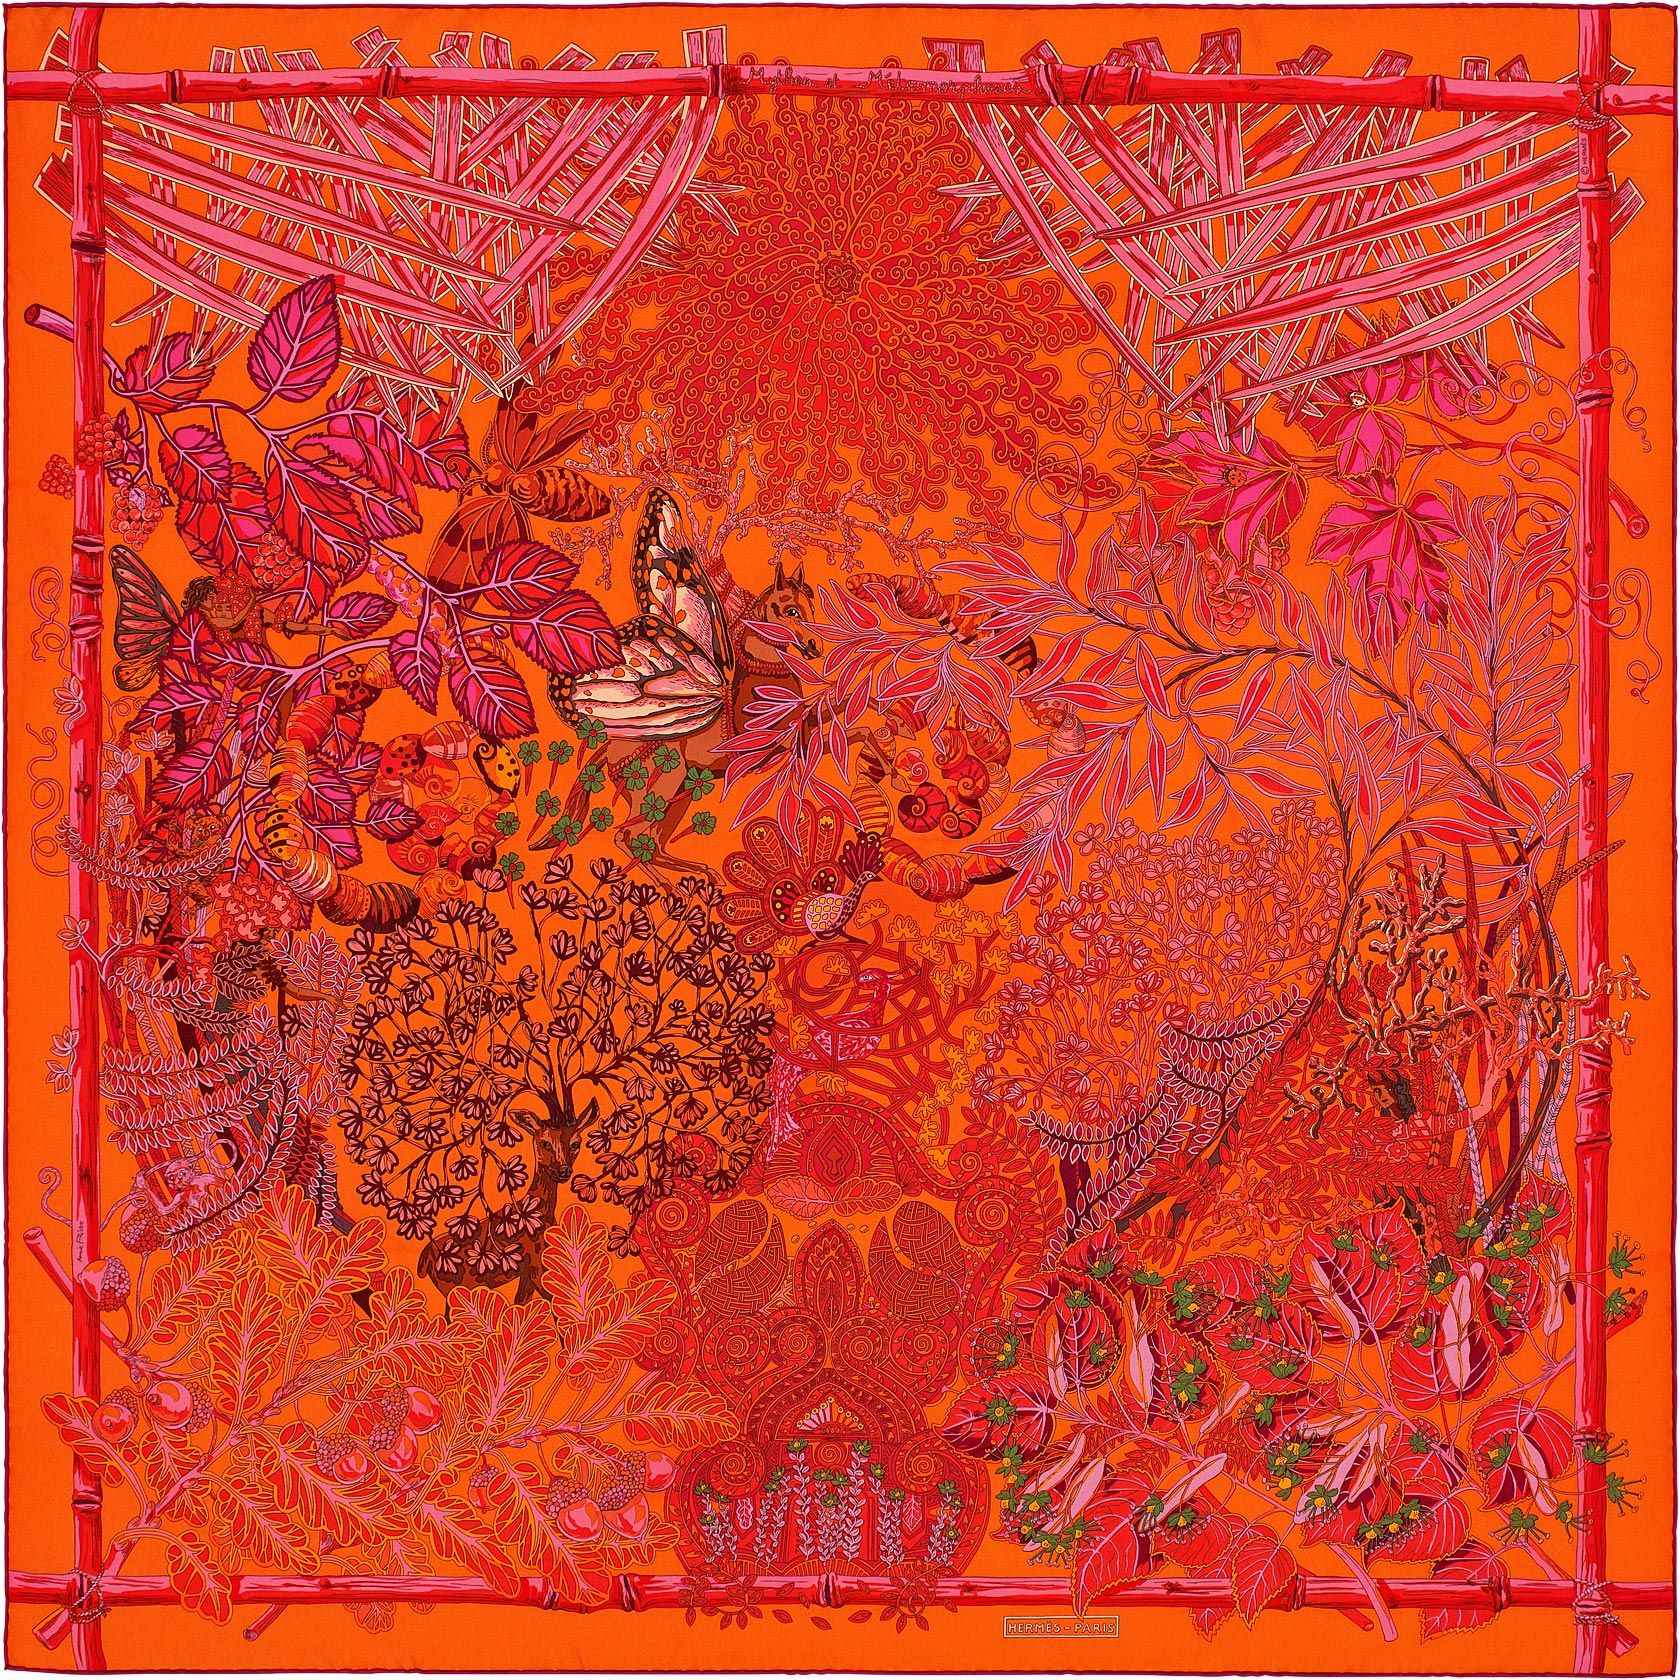 Mythes et Métamorphoses | Silk twill scarf, hand-rolled (90 cm x 90 cm) | Ref. : H002814S 09